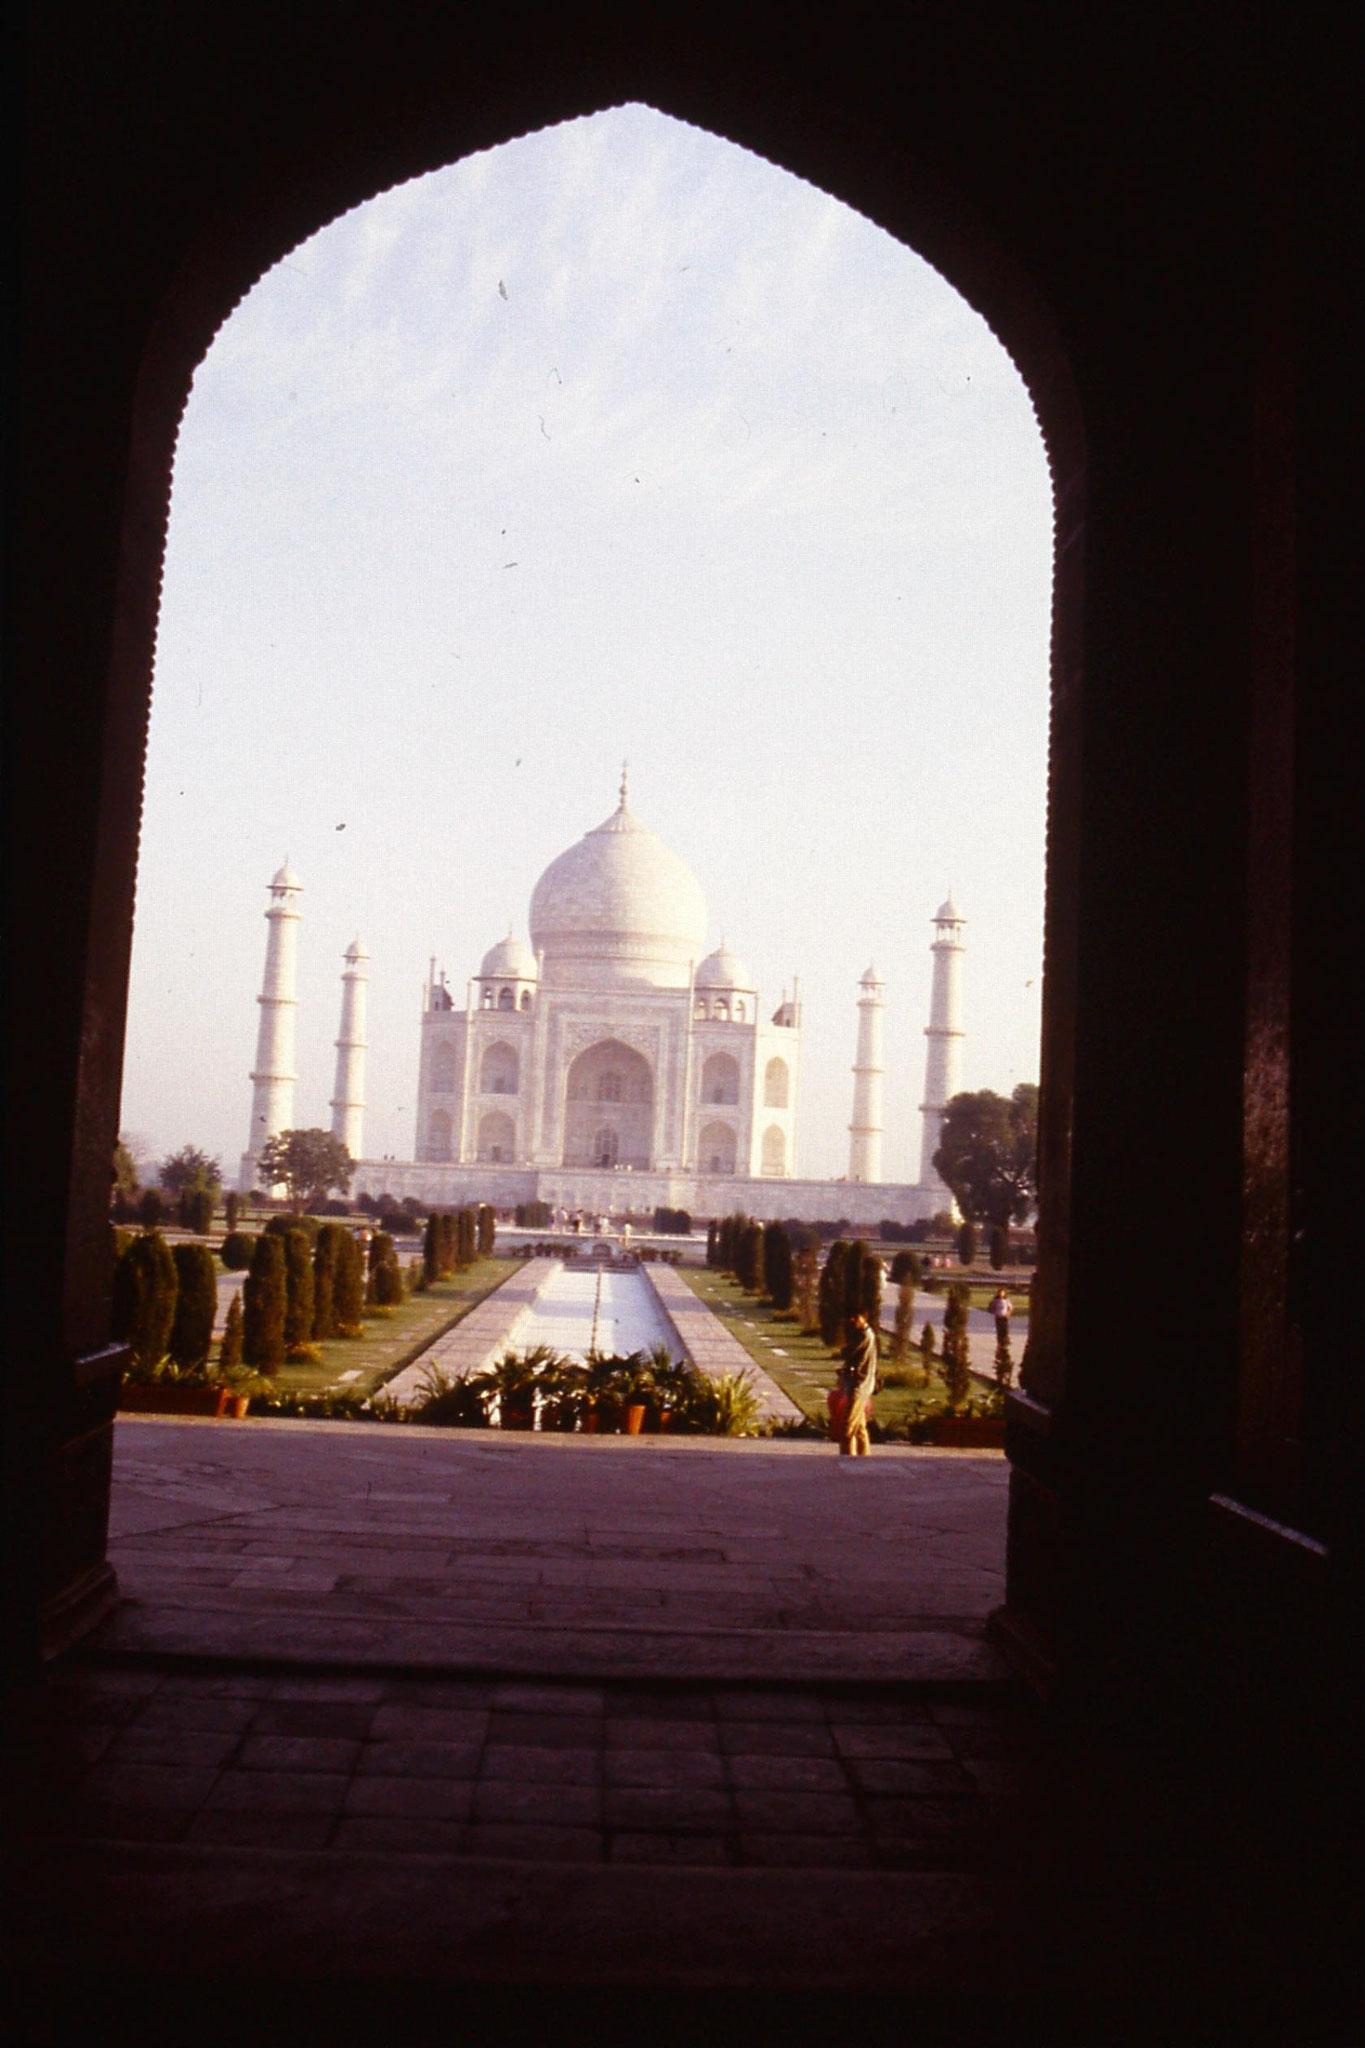 109/8: 31/3/1990 Taj framed by entrance gate